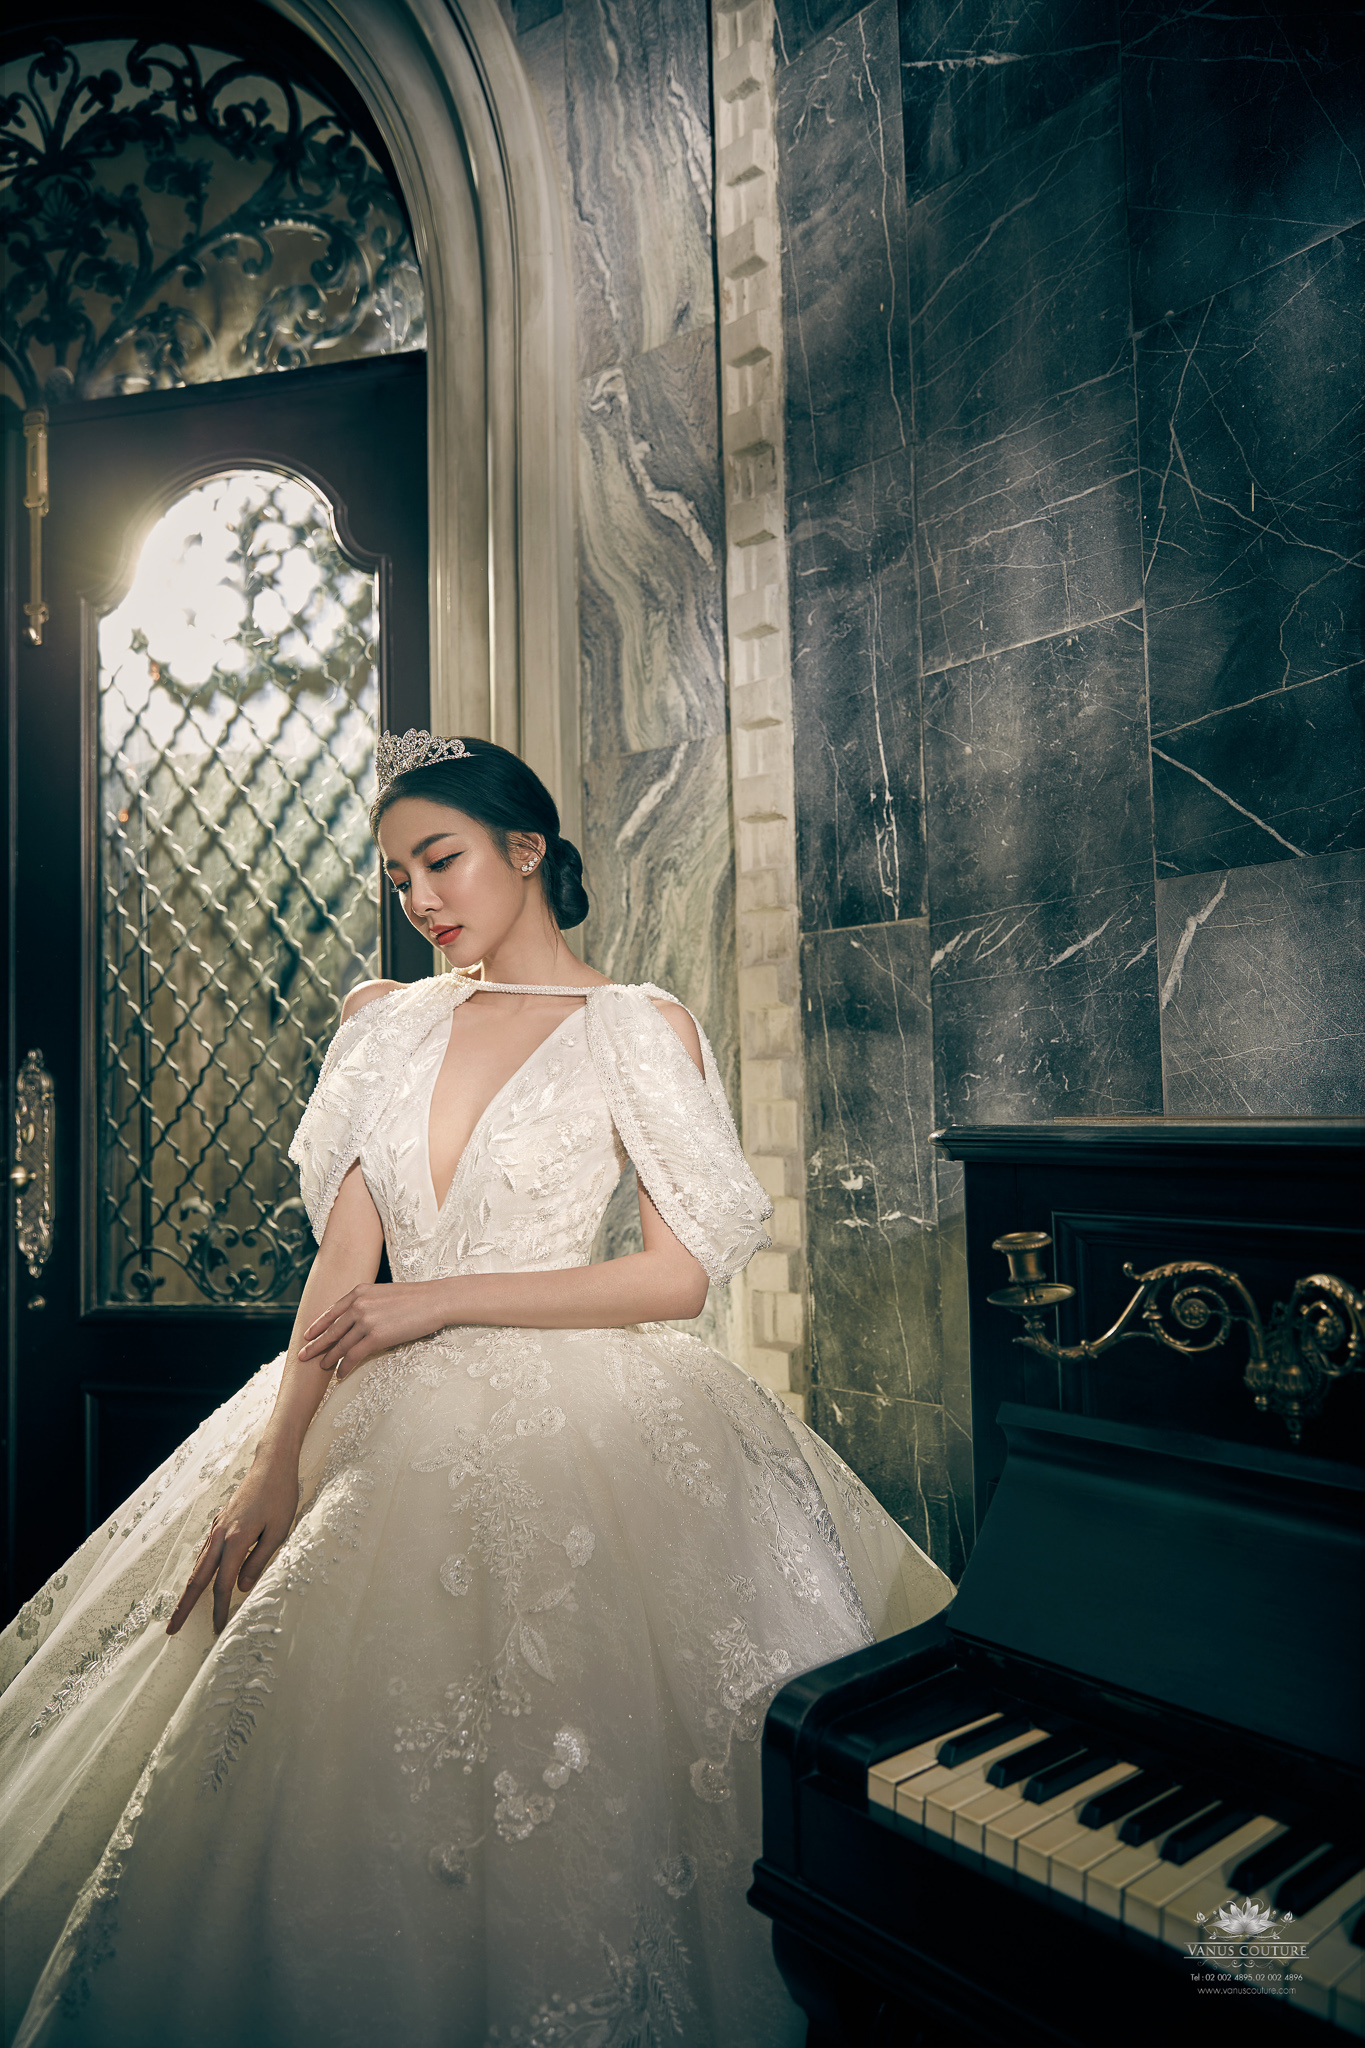 Superball wedding dress - Gybzy 08